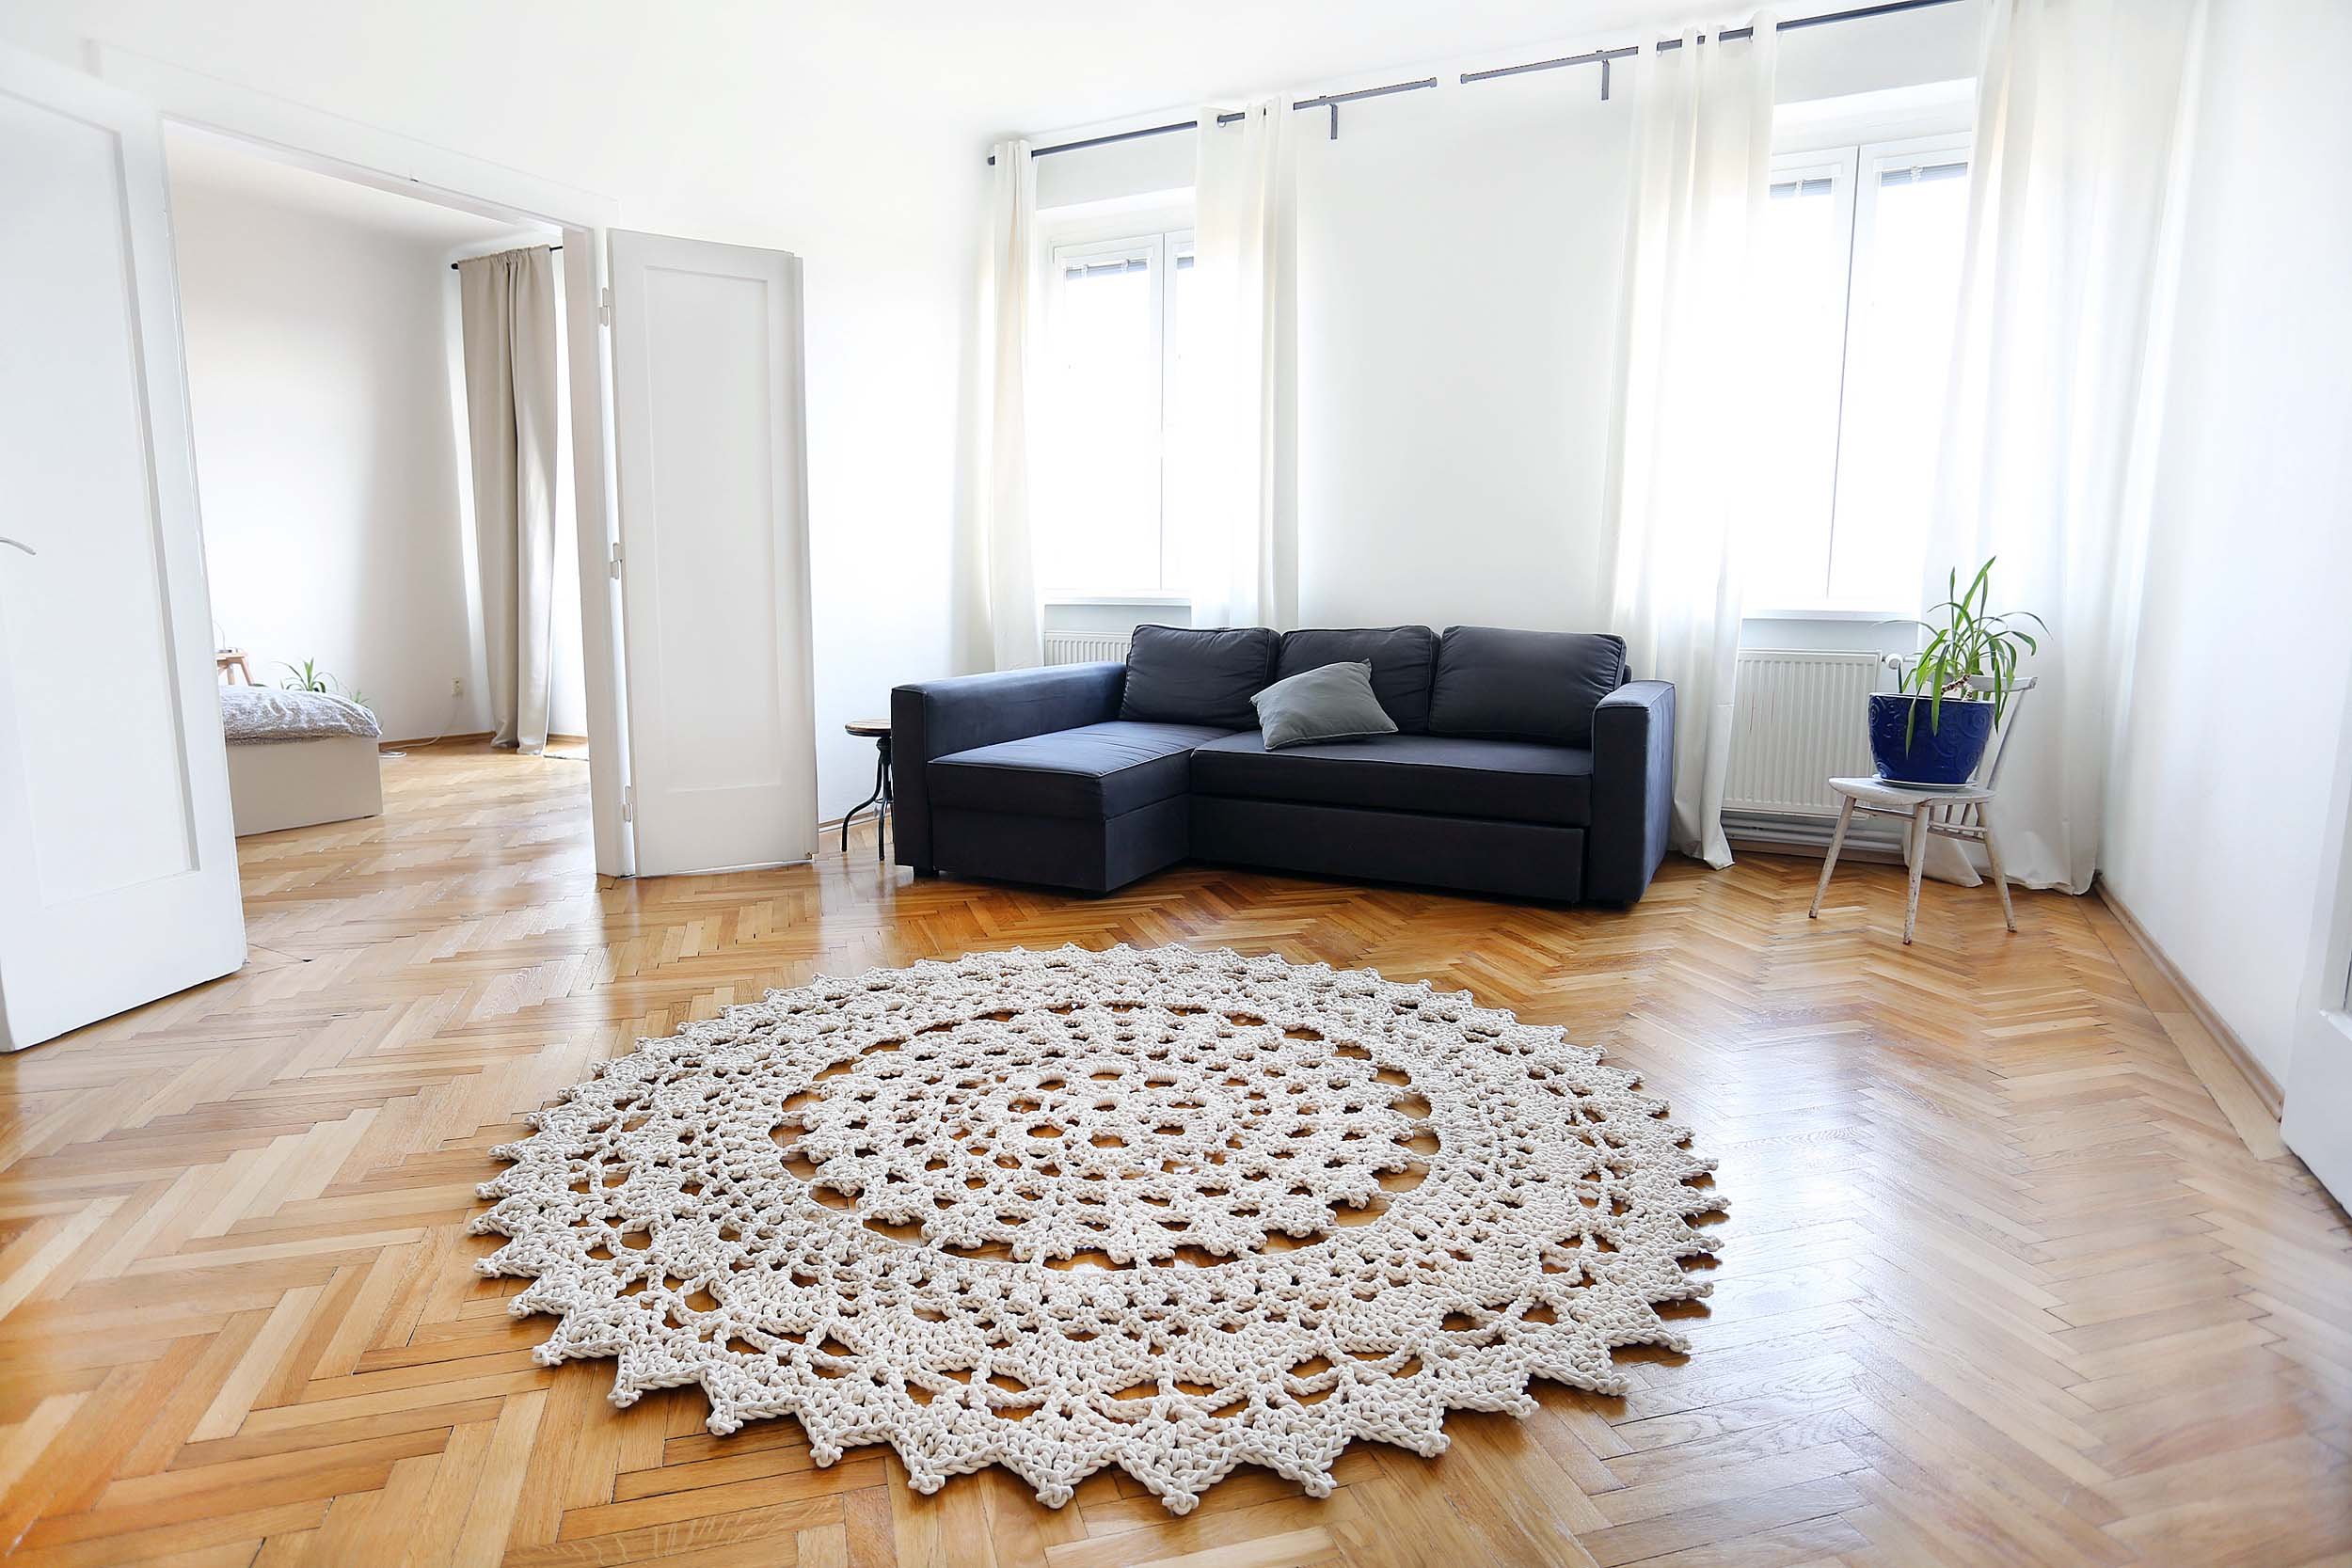 koberec Päike, průměr 2,3 m, 100% bavlna